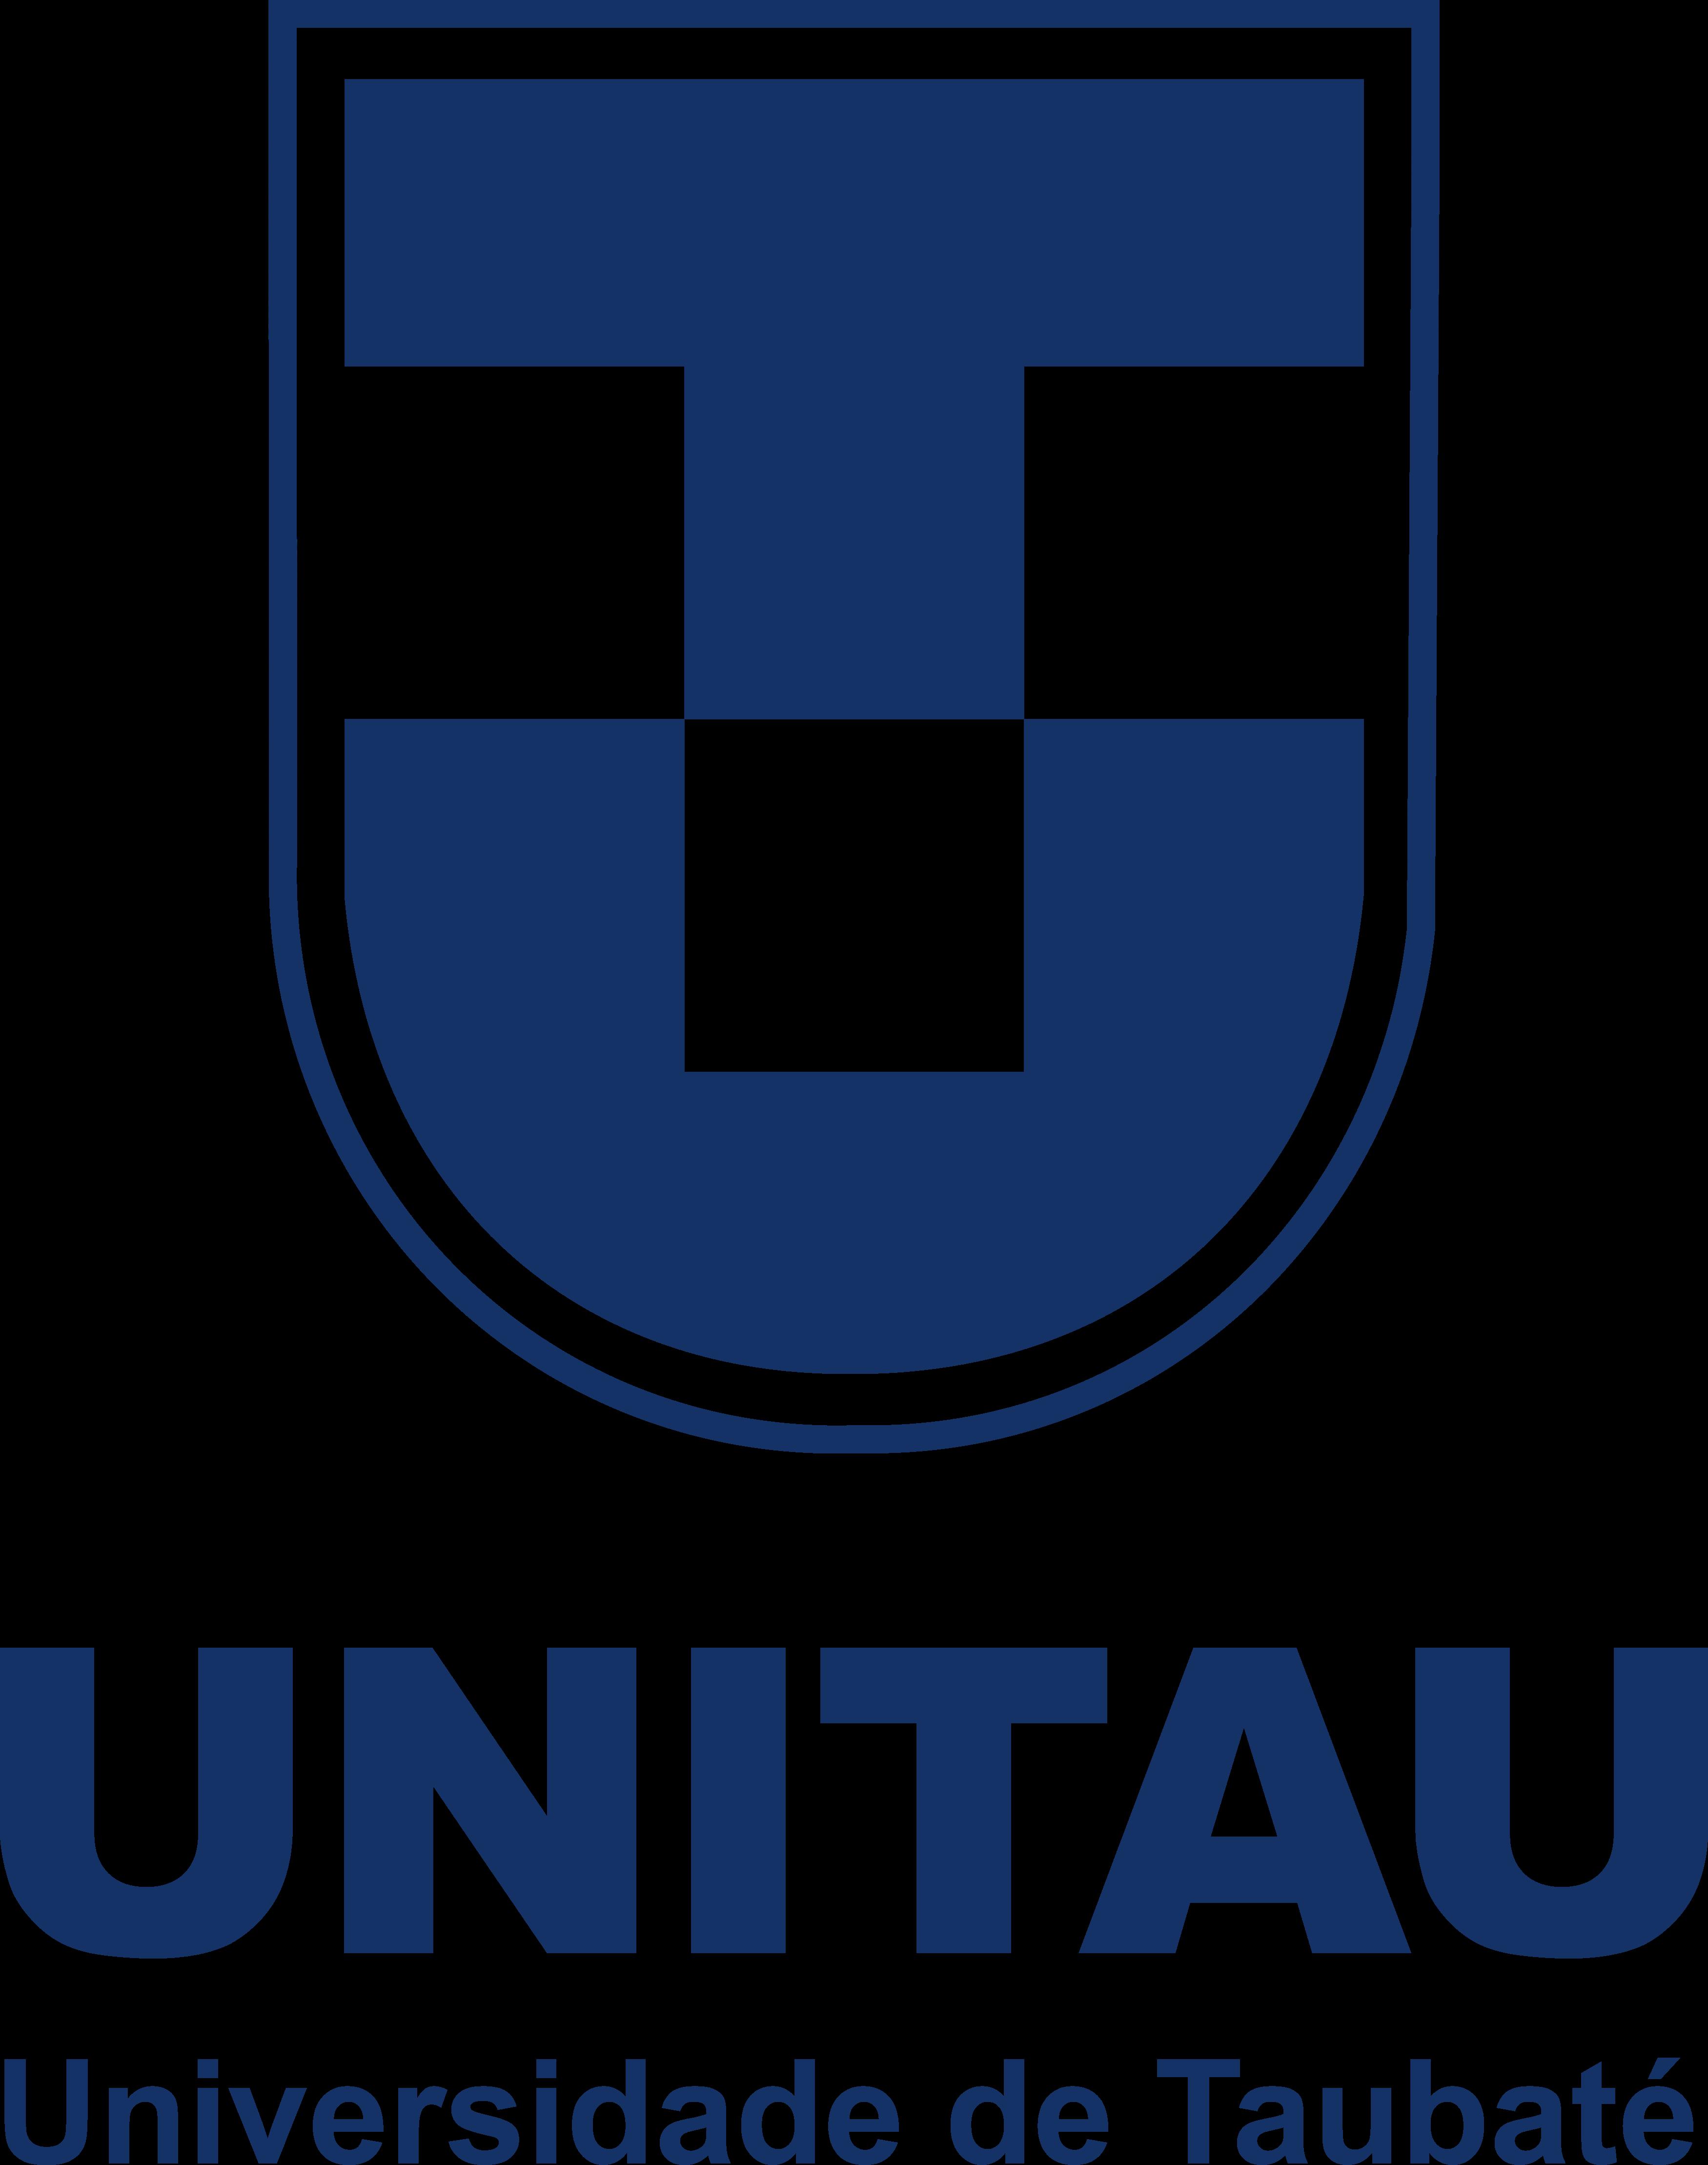 Unitau Logo.